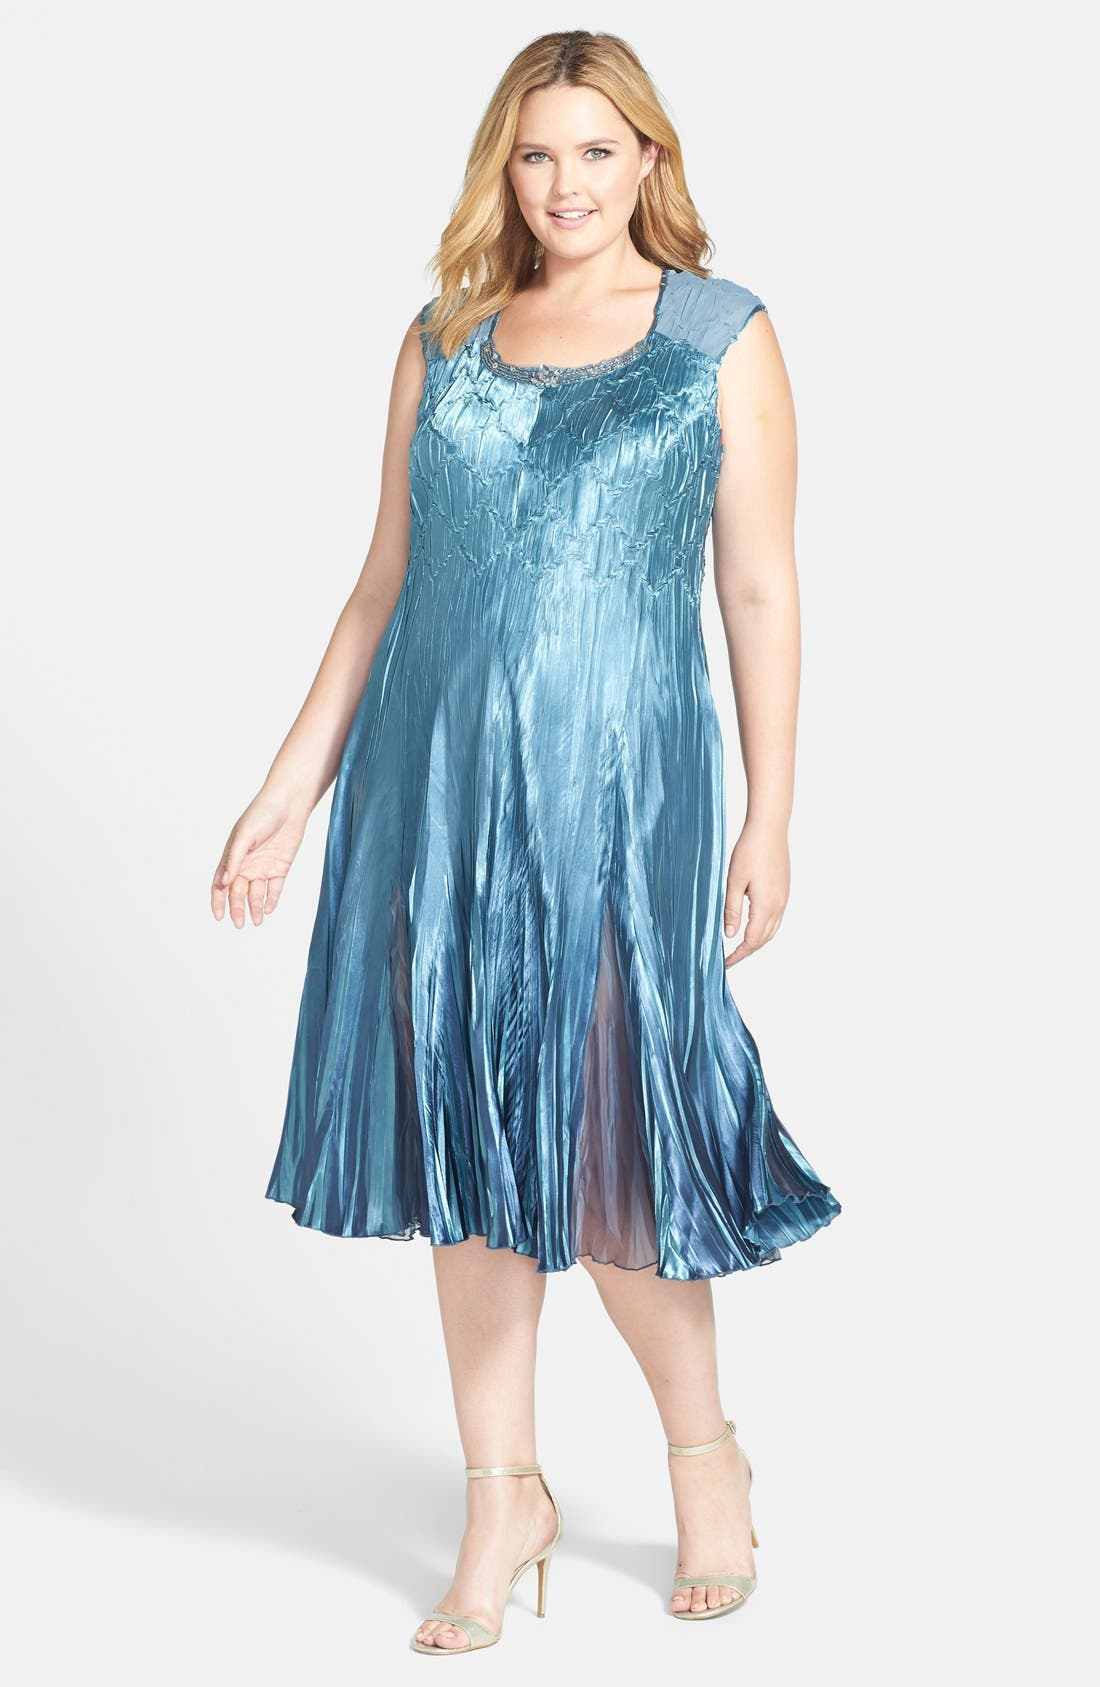 Embellished Charmeuse & Chiffon Dress with Jacket,                             Alternate thumbnail 9, color,                             460